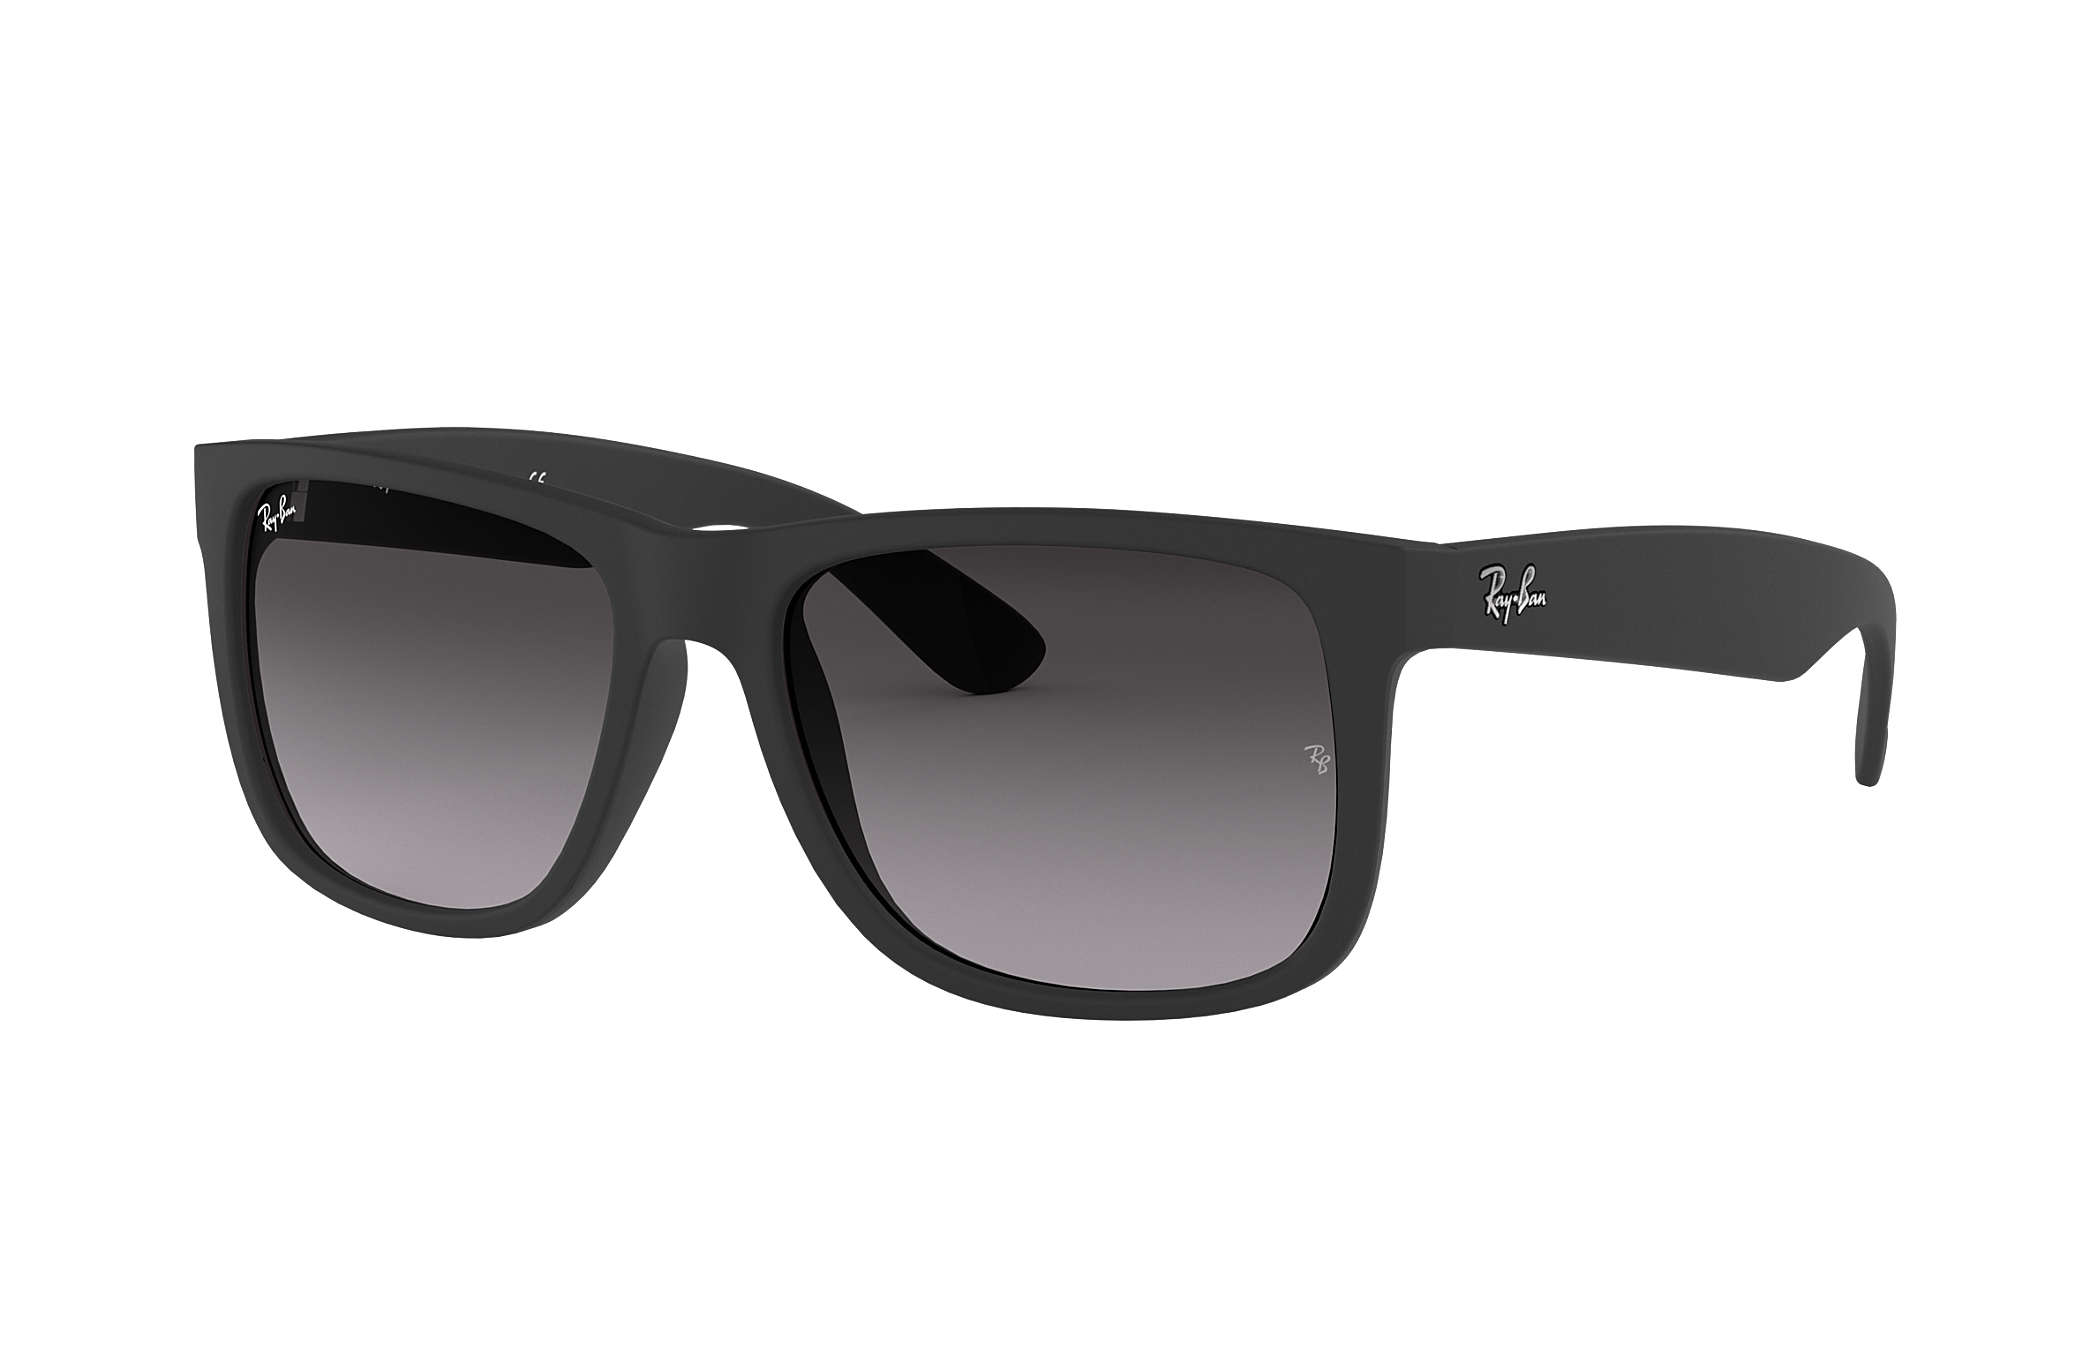 bd3ababcae538 Ray-Ban Justin Classic RB4165F Black - Nylon - Grey Lenses ...